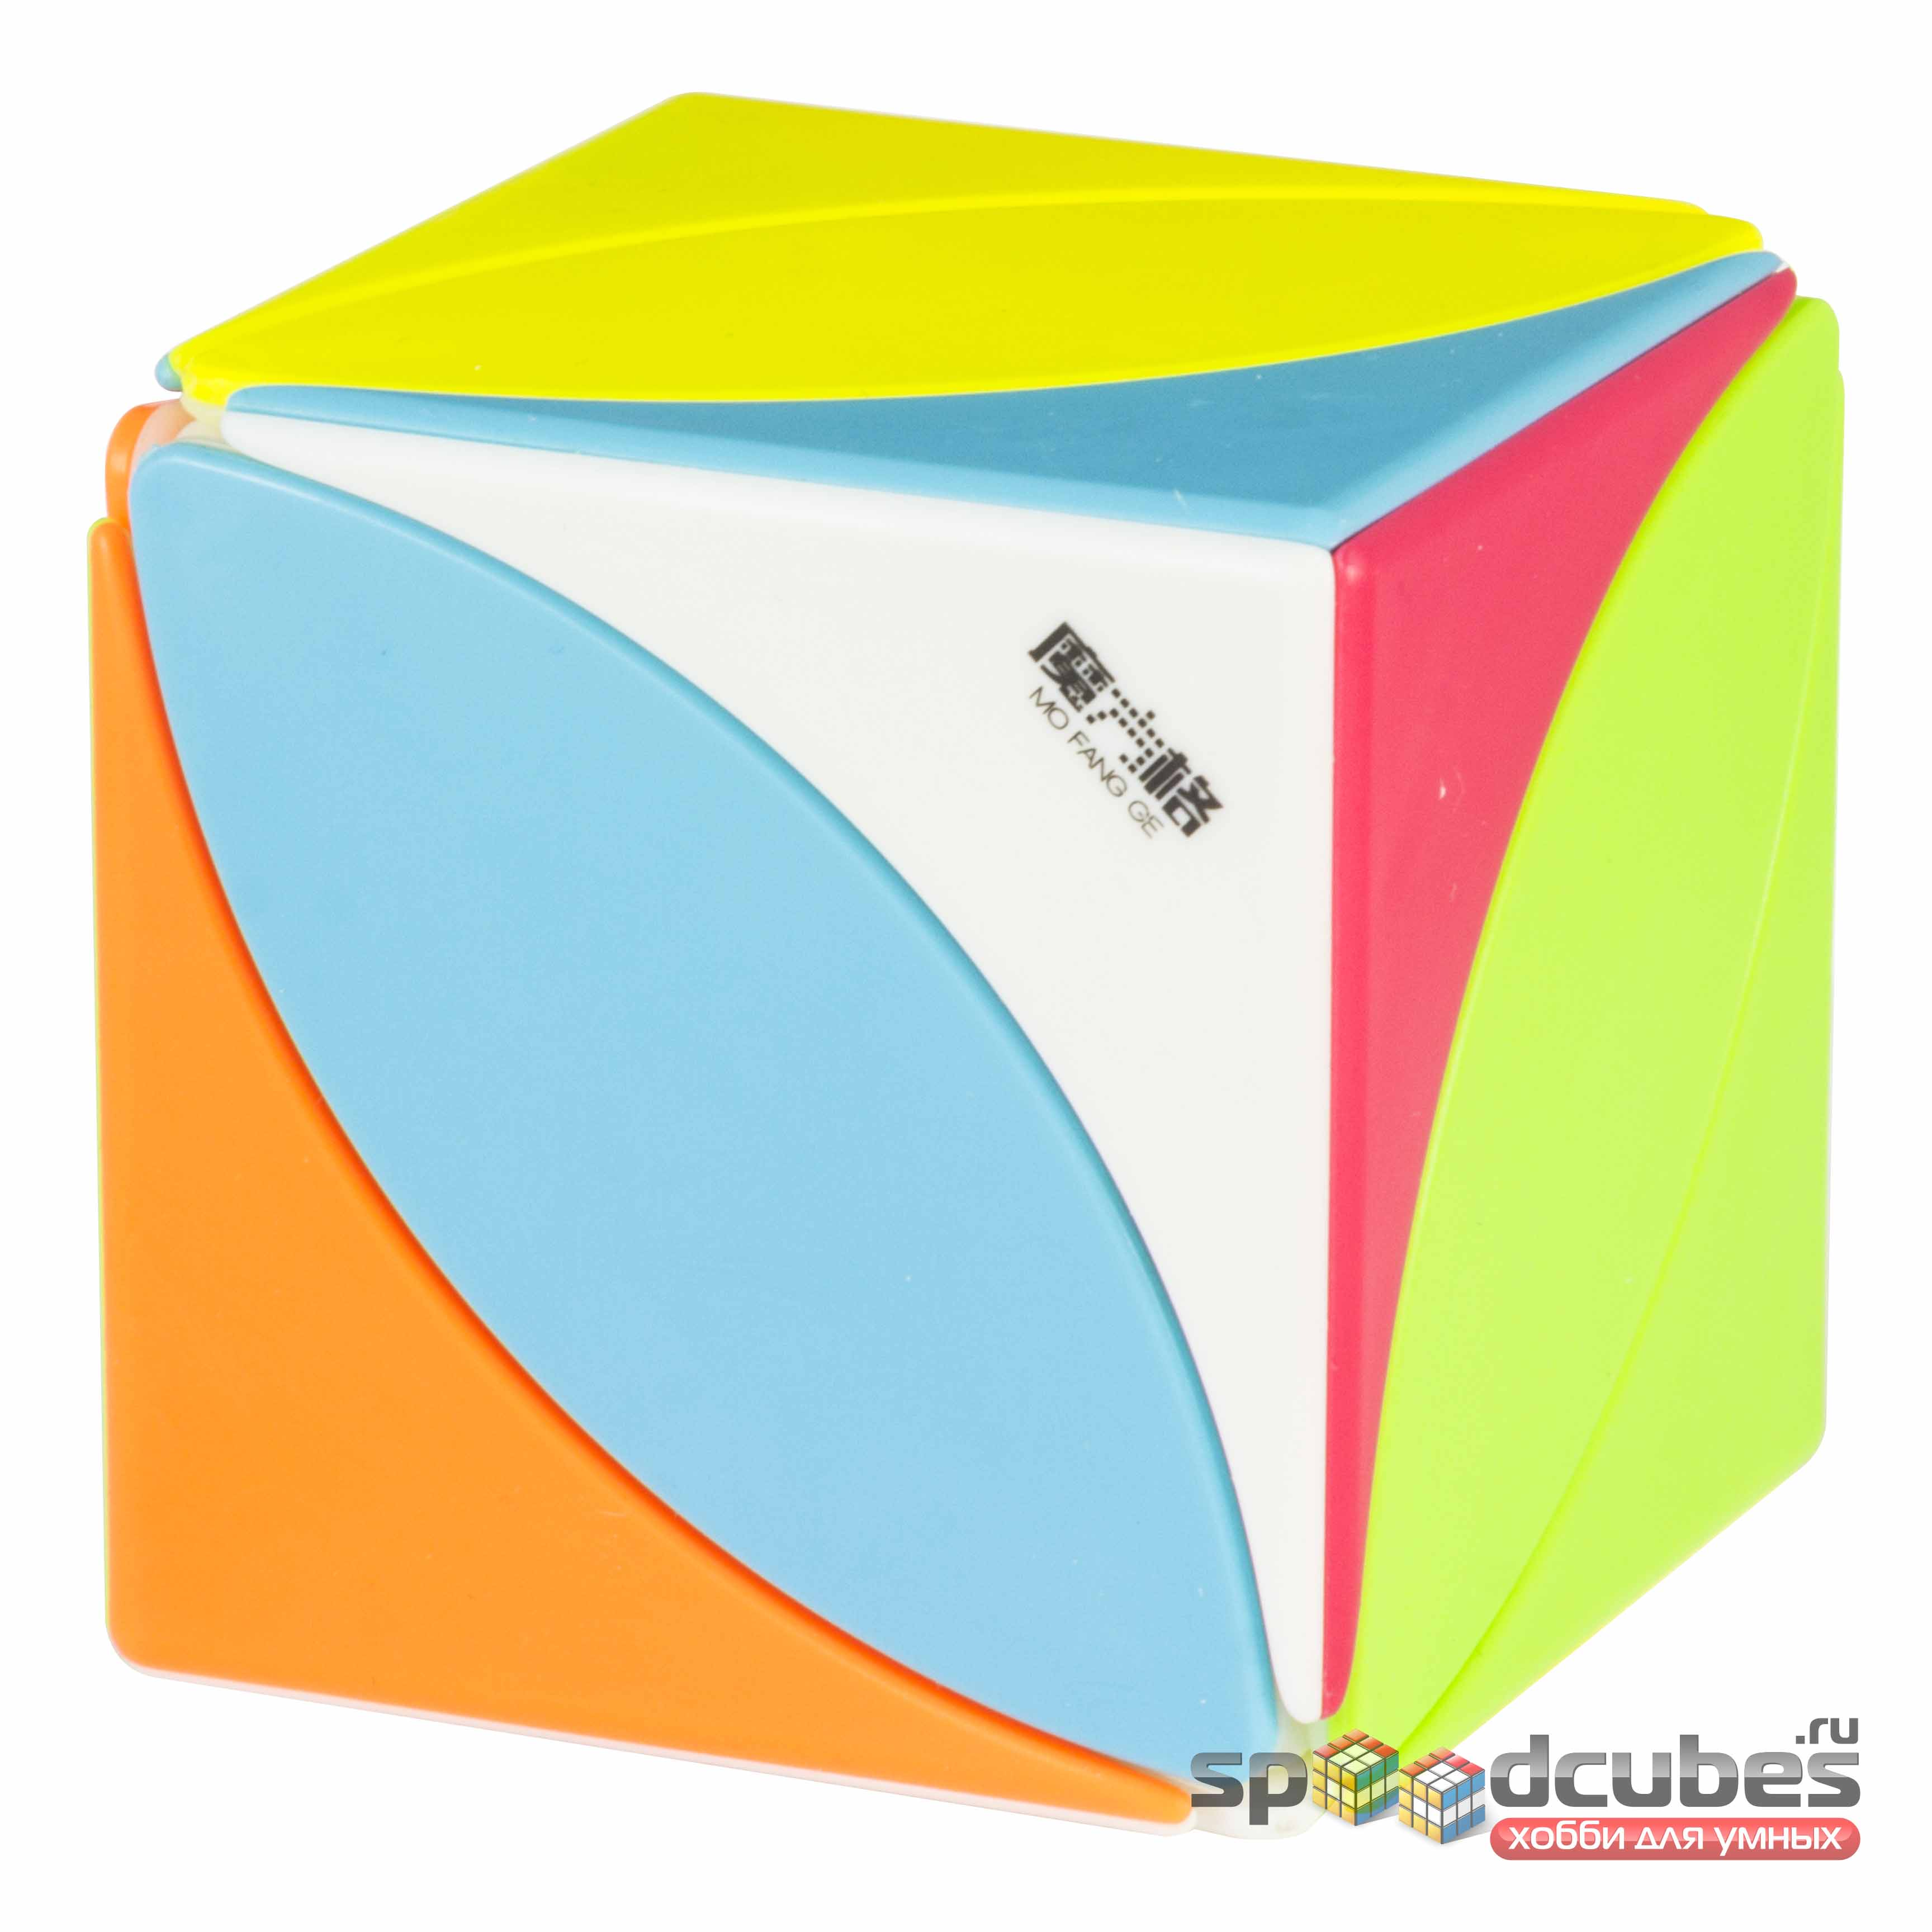 QiYi (MoFangGe) Ivy Cube Color 3